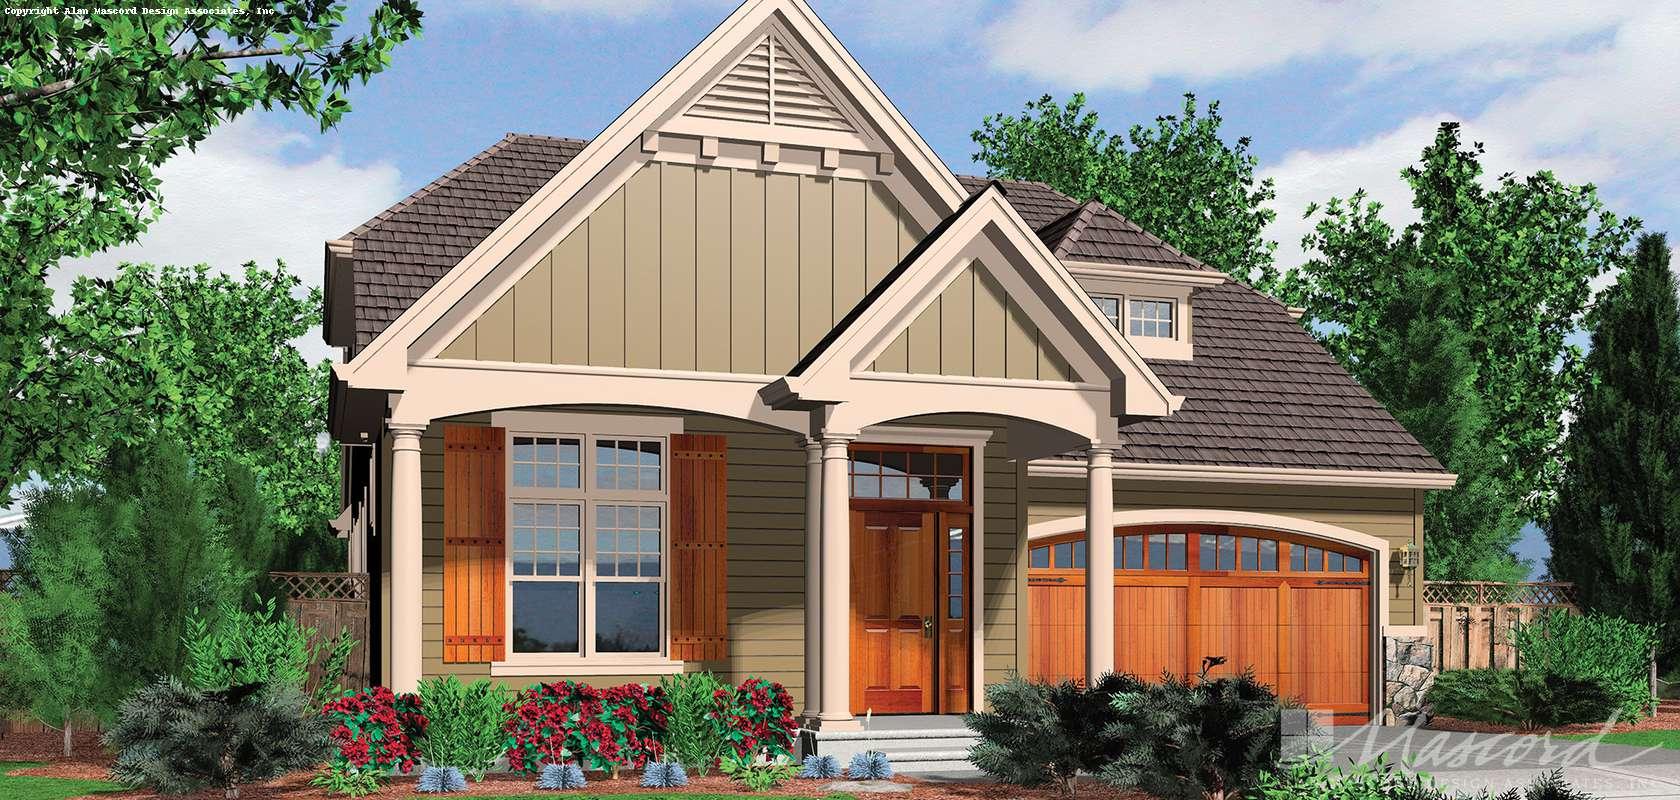 Mascord House Plan B22144A: The Seneca